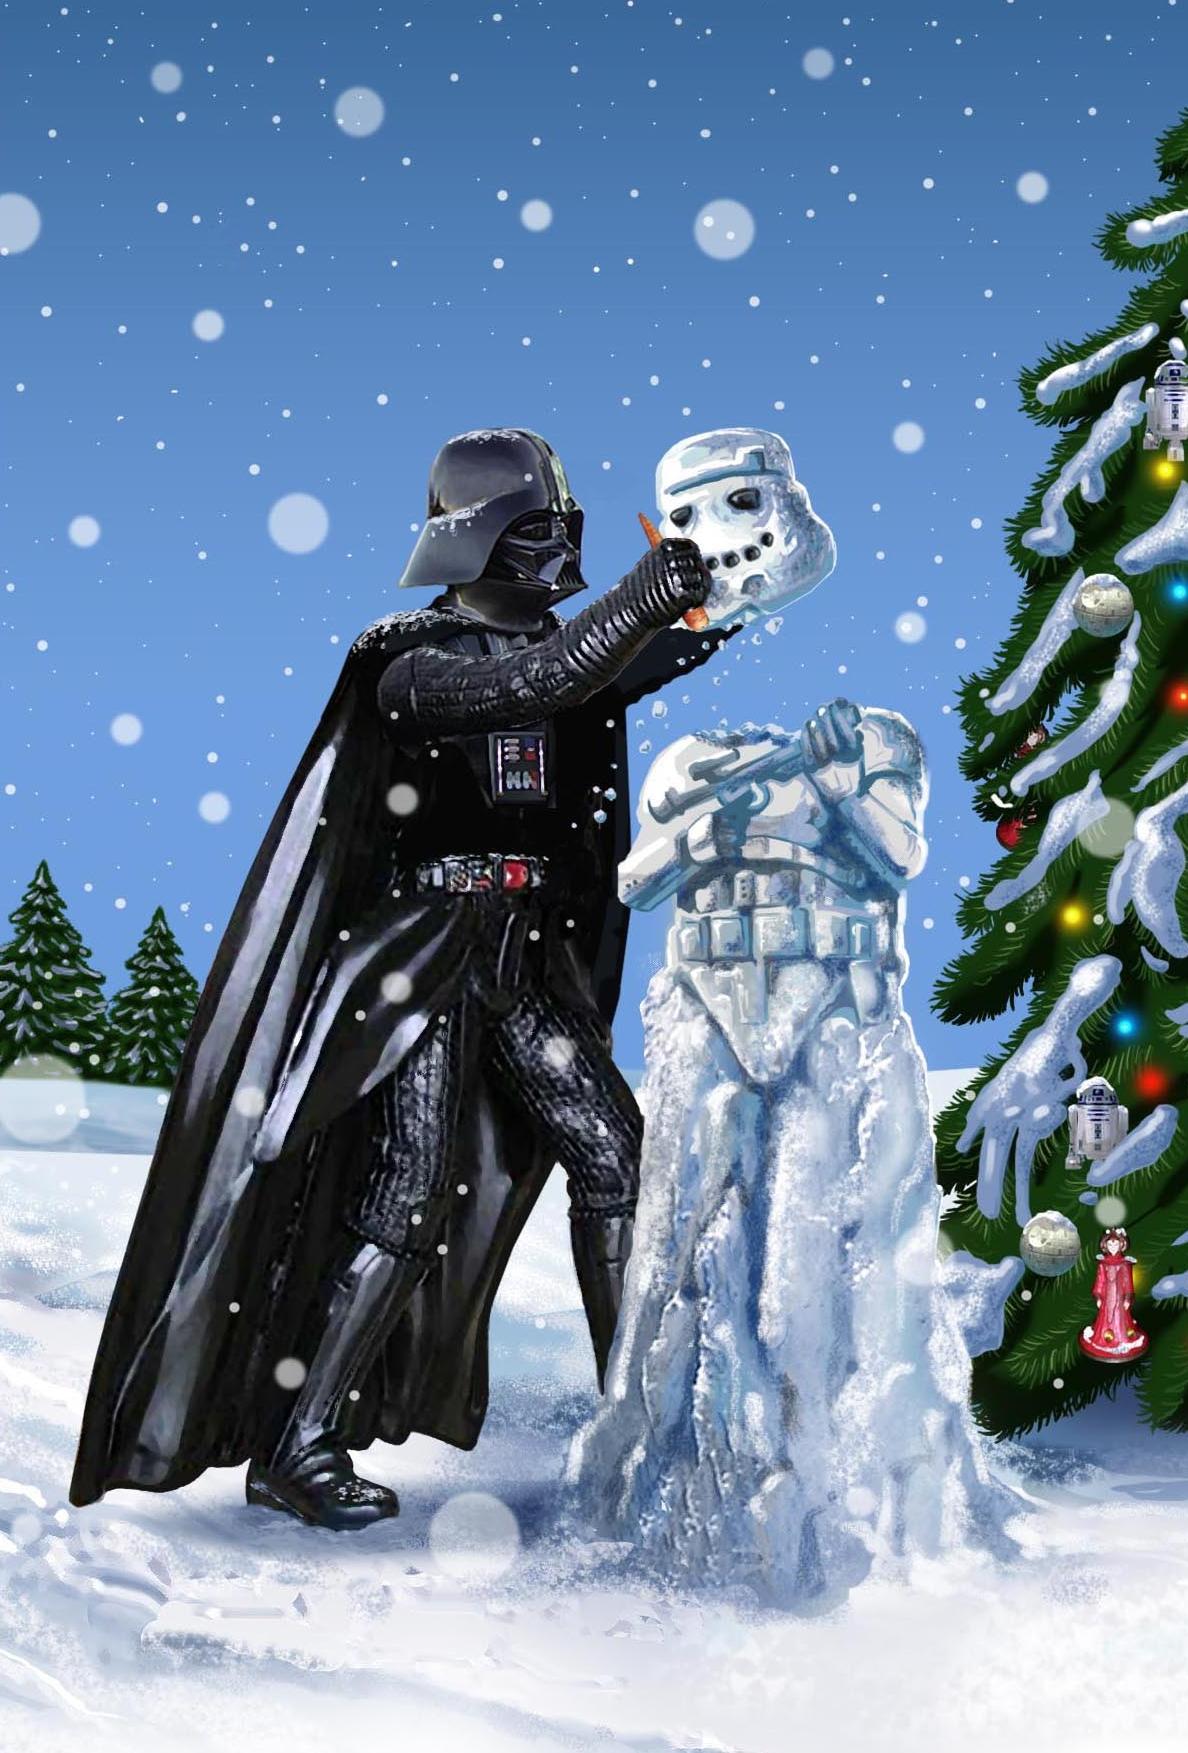 darth making snowman.jpg